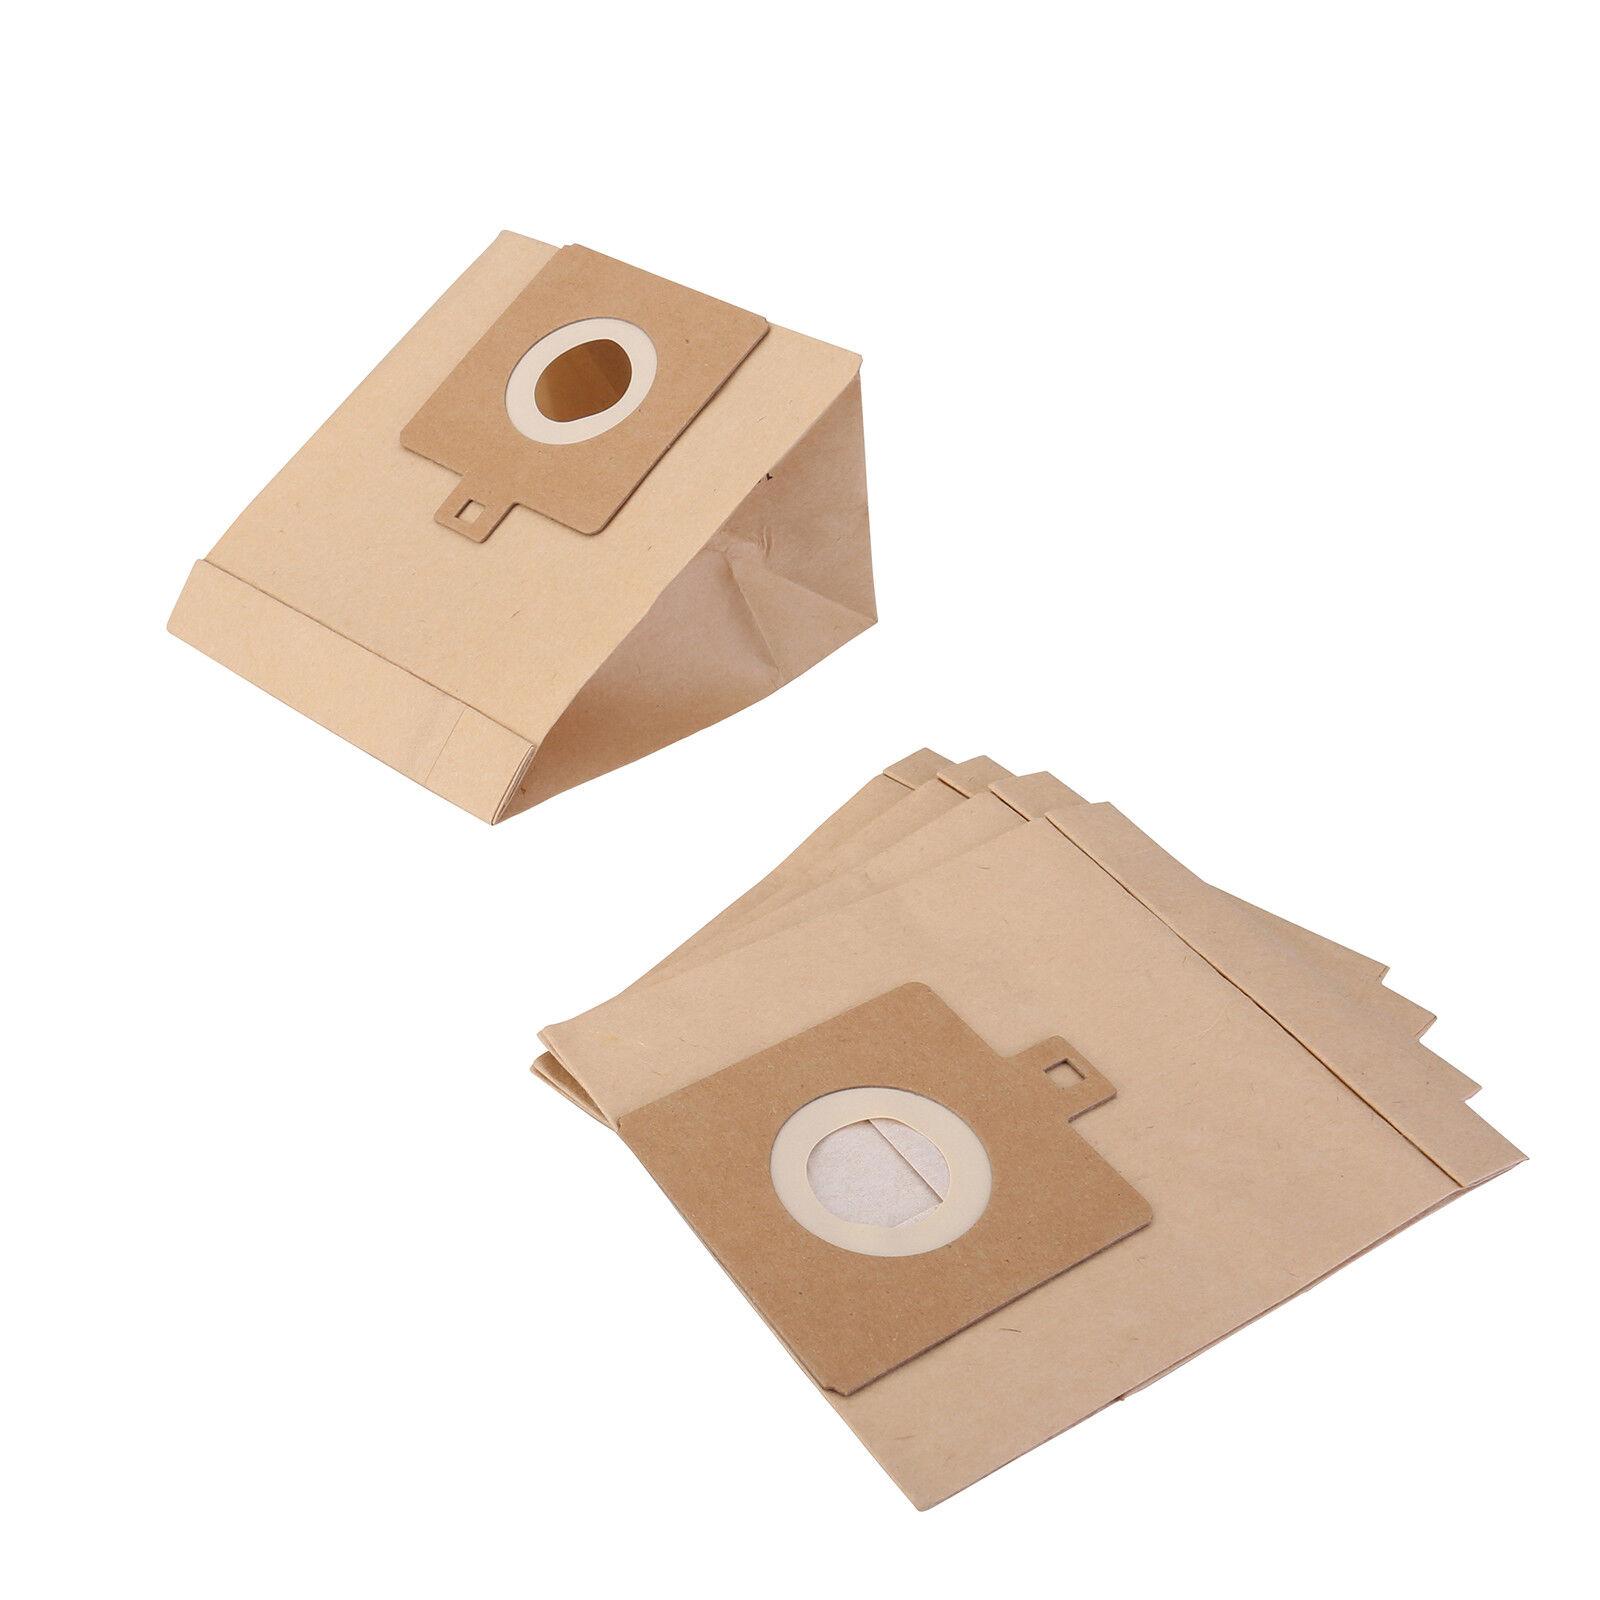 5 X Fits ELECTROLUX U59 VACUUM CLEANER Hoover DUST PAPER BAGS Z3318 Z3319 B3300